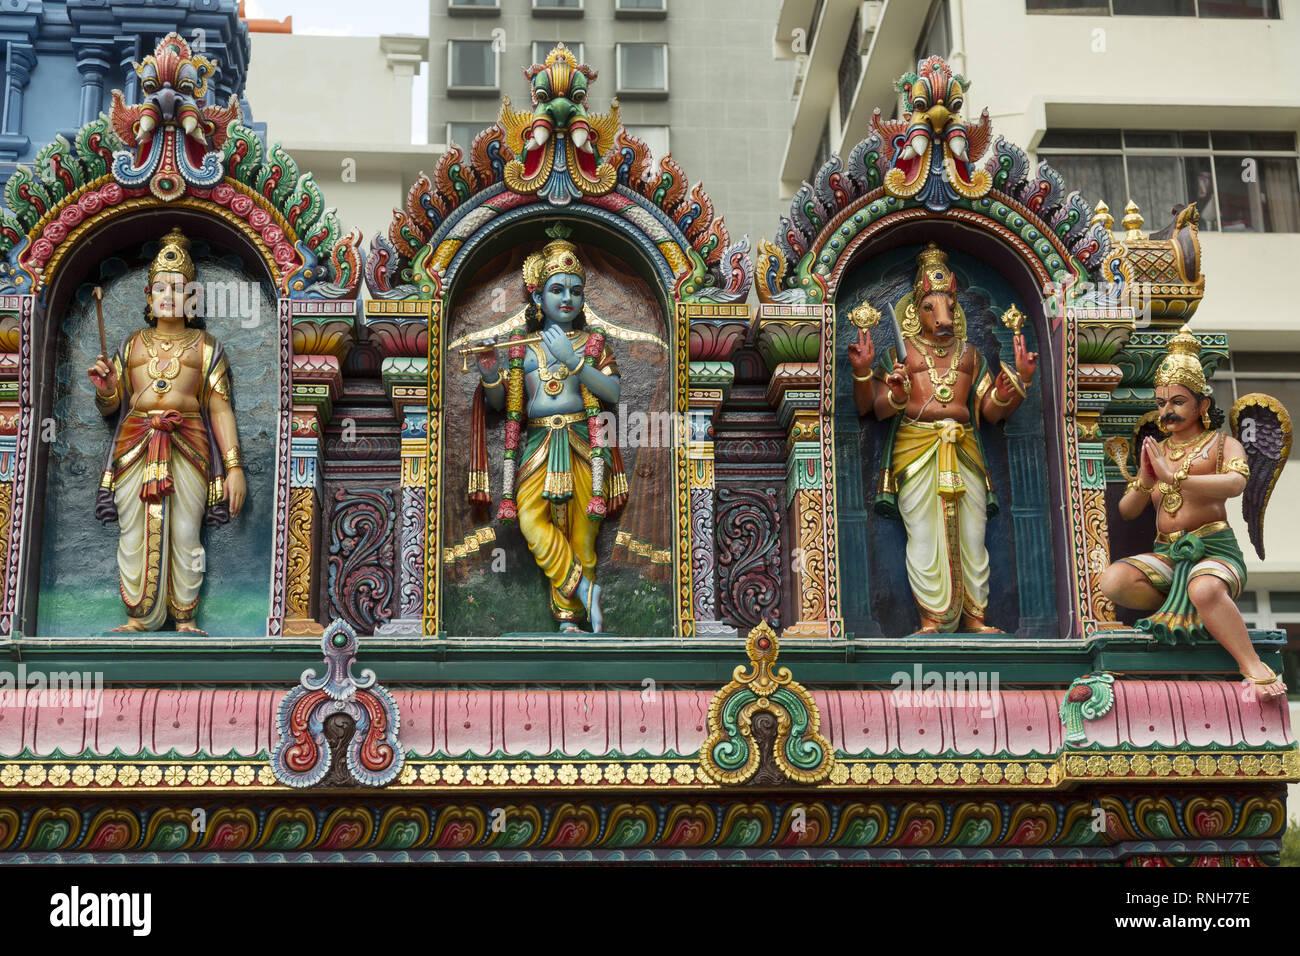 Tempio indù di Singapore Immagini Stock